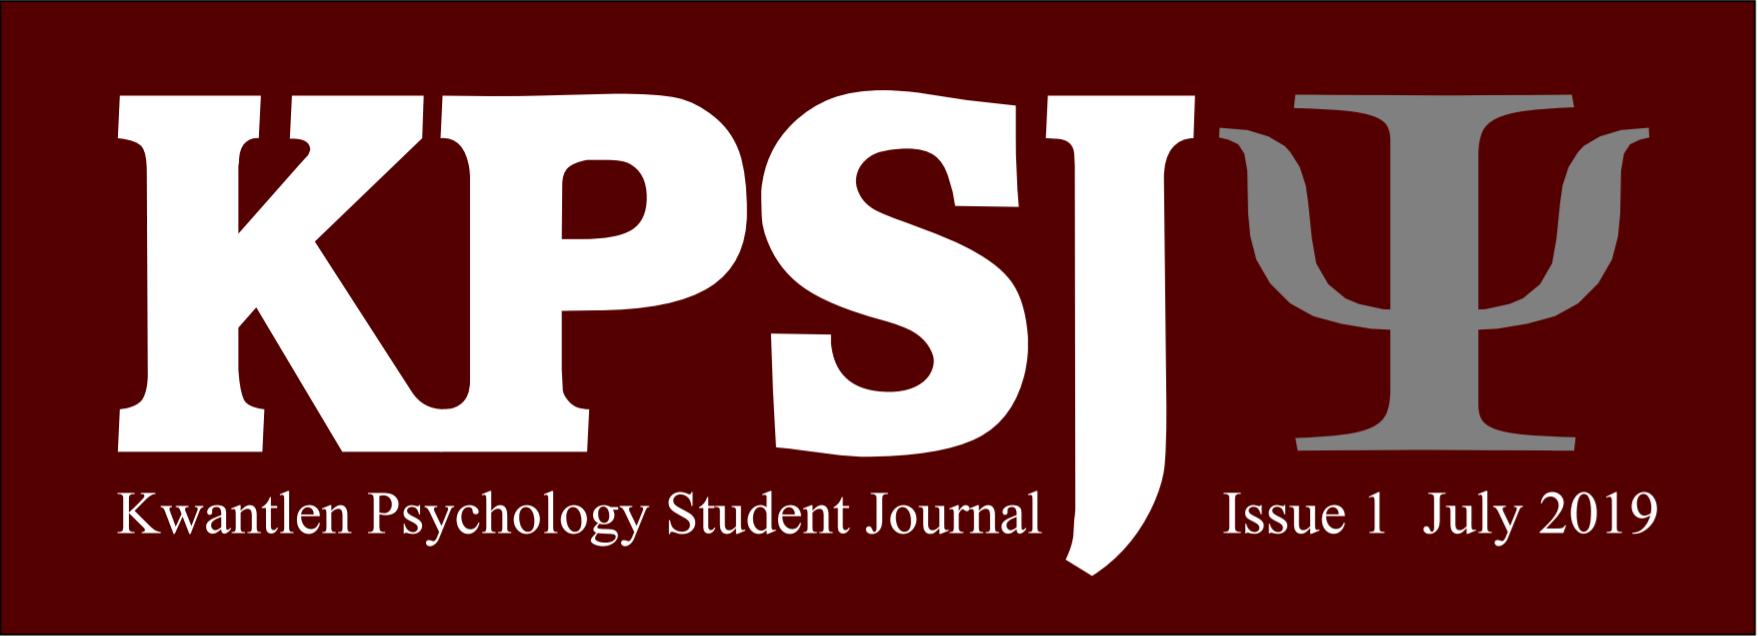 KPSJ, Kwantlen Psychology Student Journal, Issue 1, July 2019